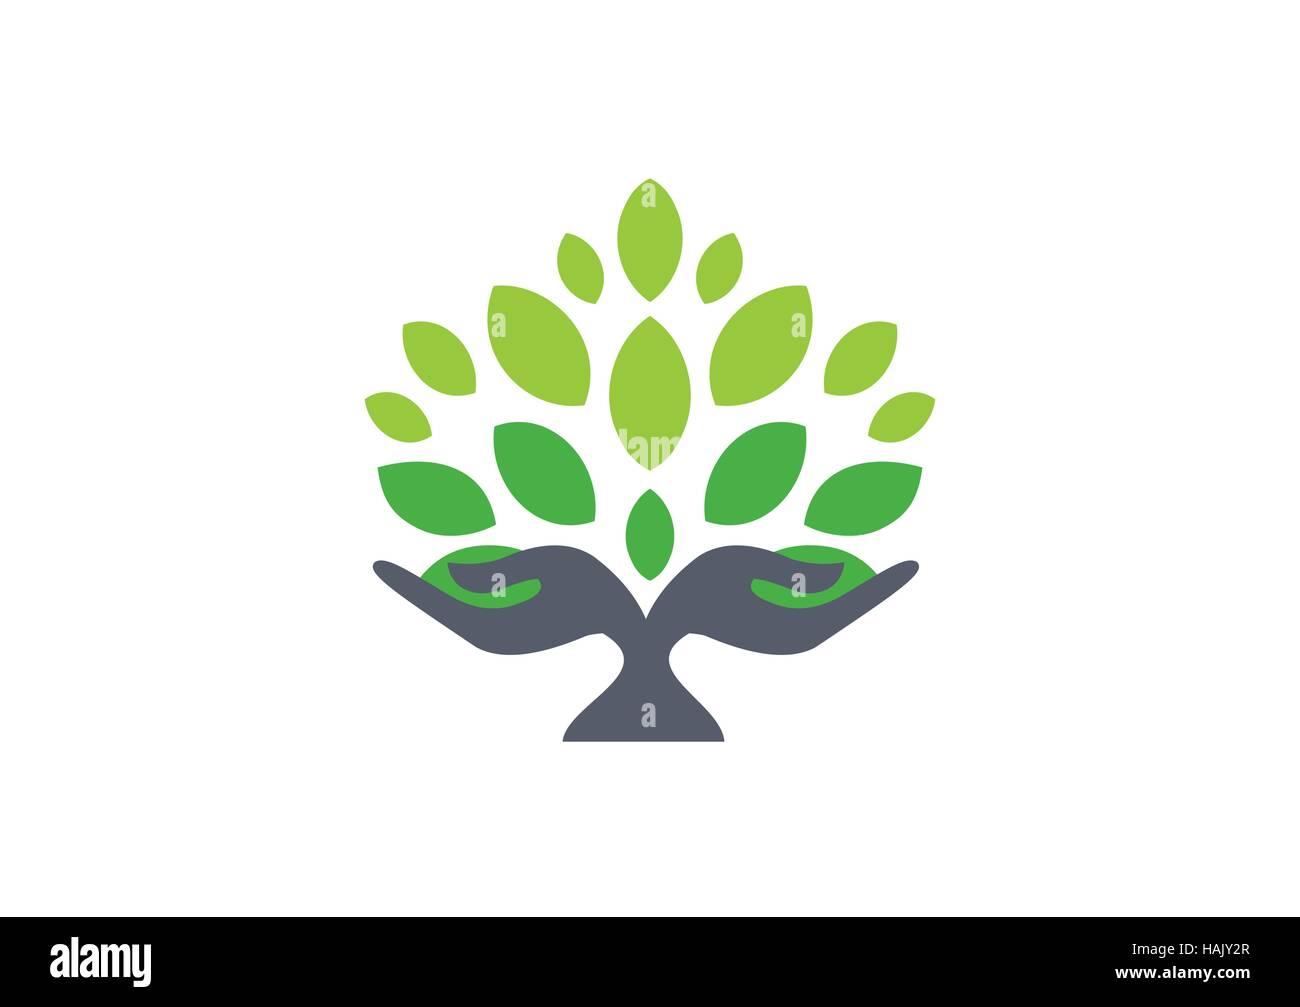 tree hand logo, hand tree nature wellness concept health symbol icon, tree and hand illustration vector template - Stock Image